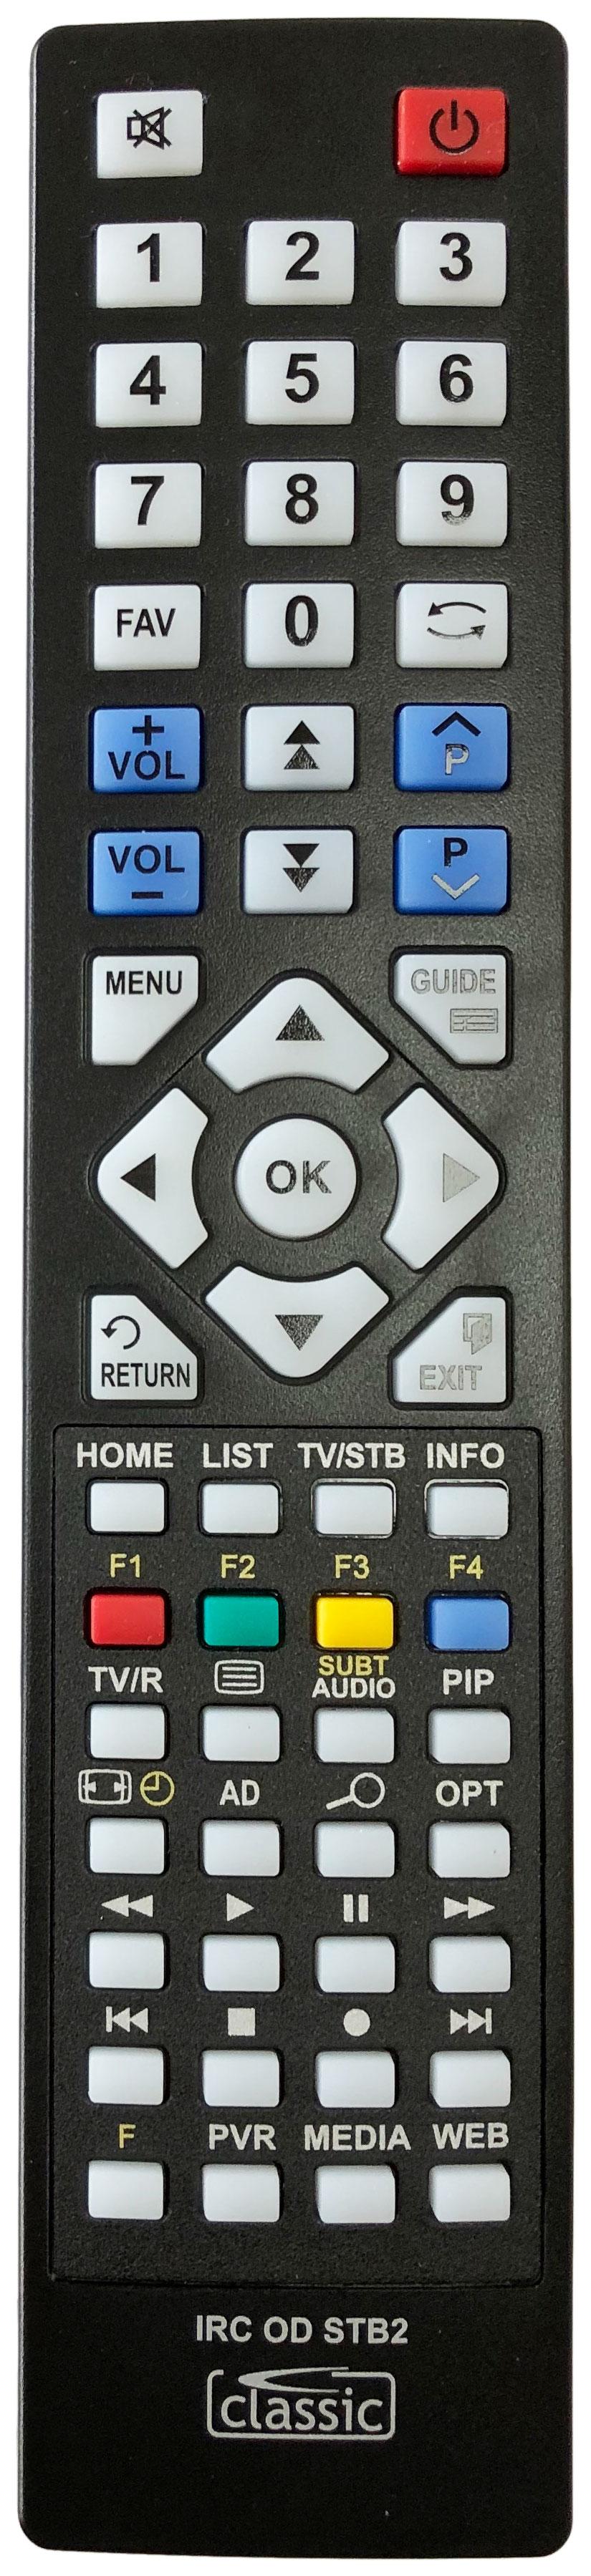 SAGEMCOM RT190 T2 UK Remote Control Alternative